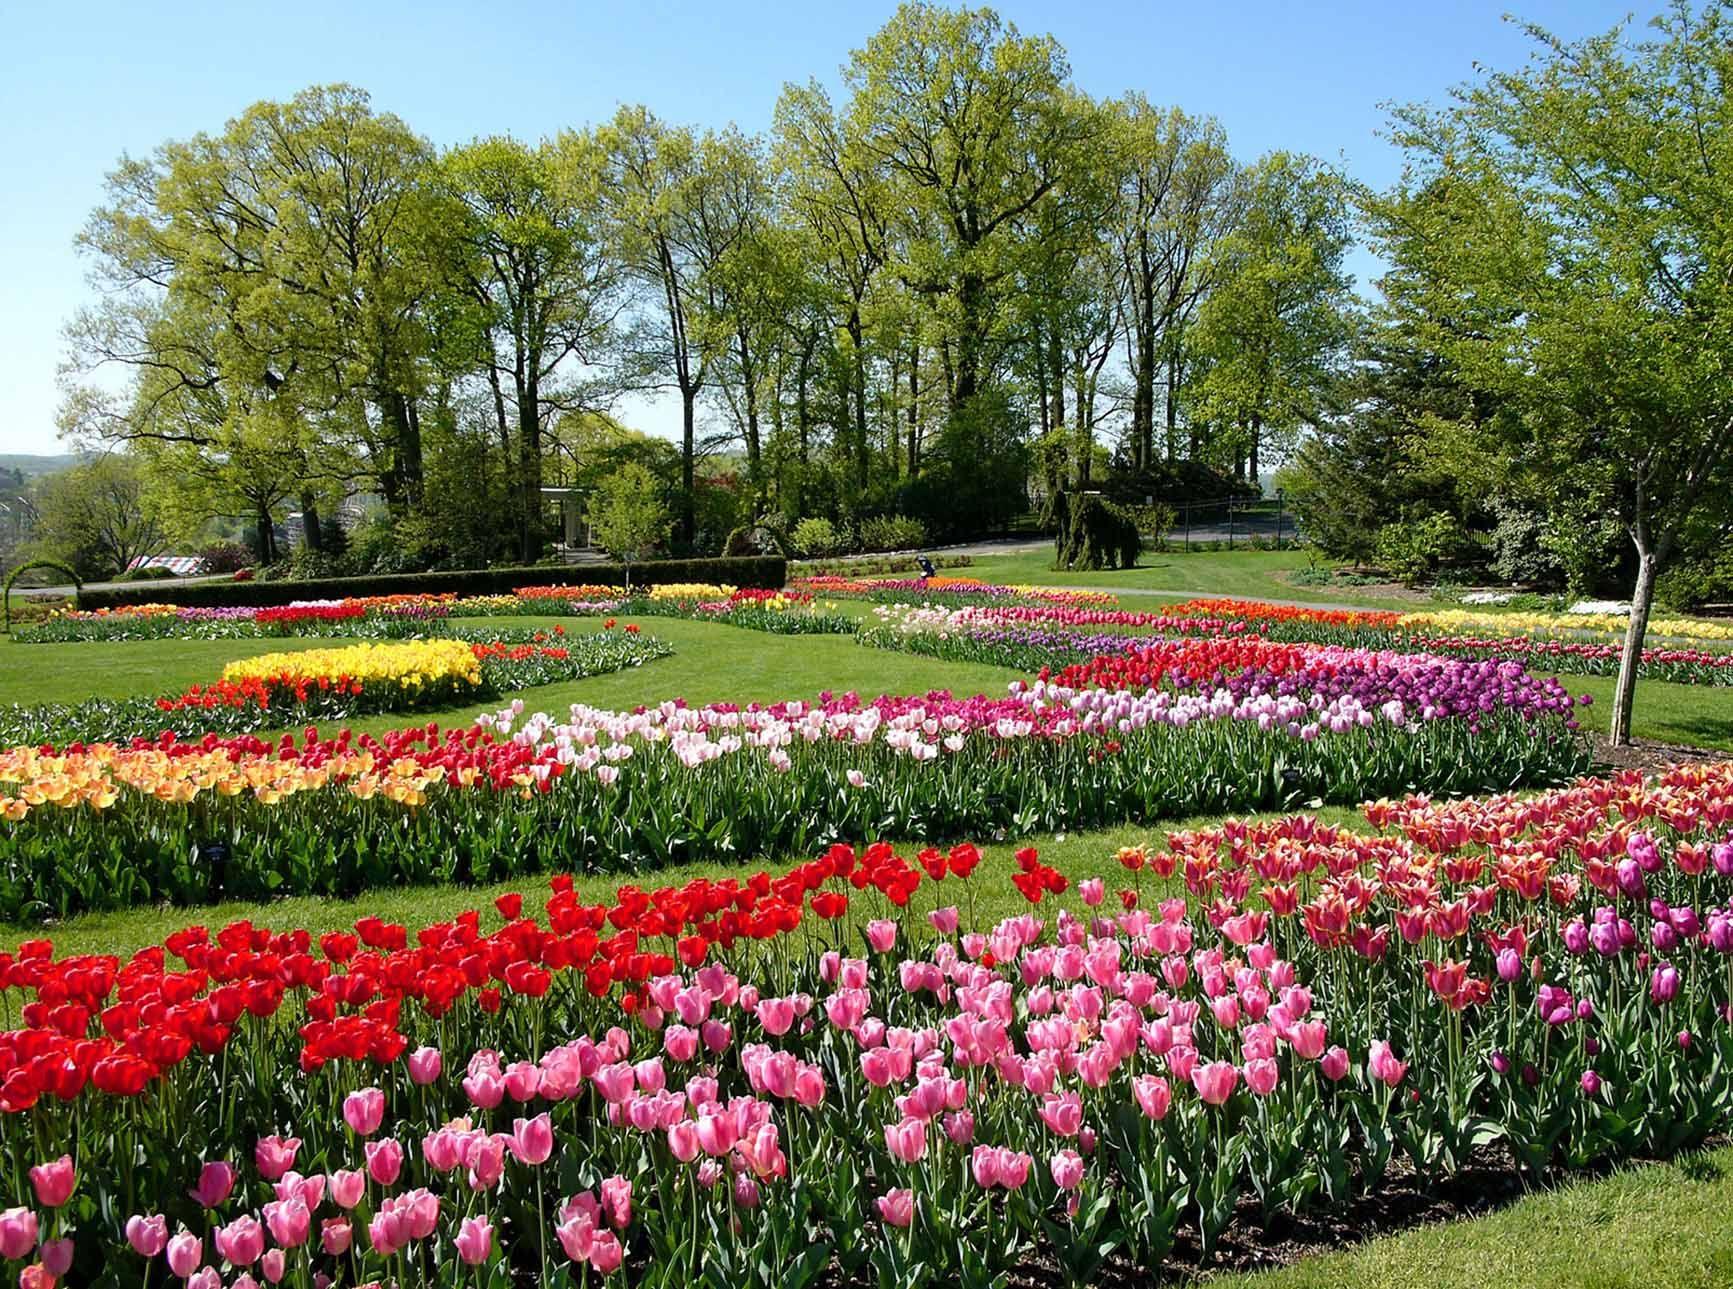 Populares Wallpaper de flores coloridas no jardim | Jardins e campos de  OV18